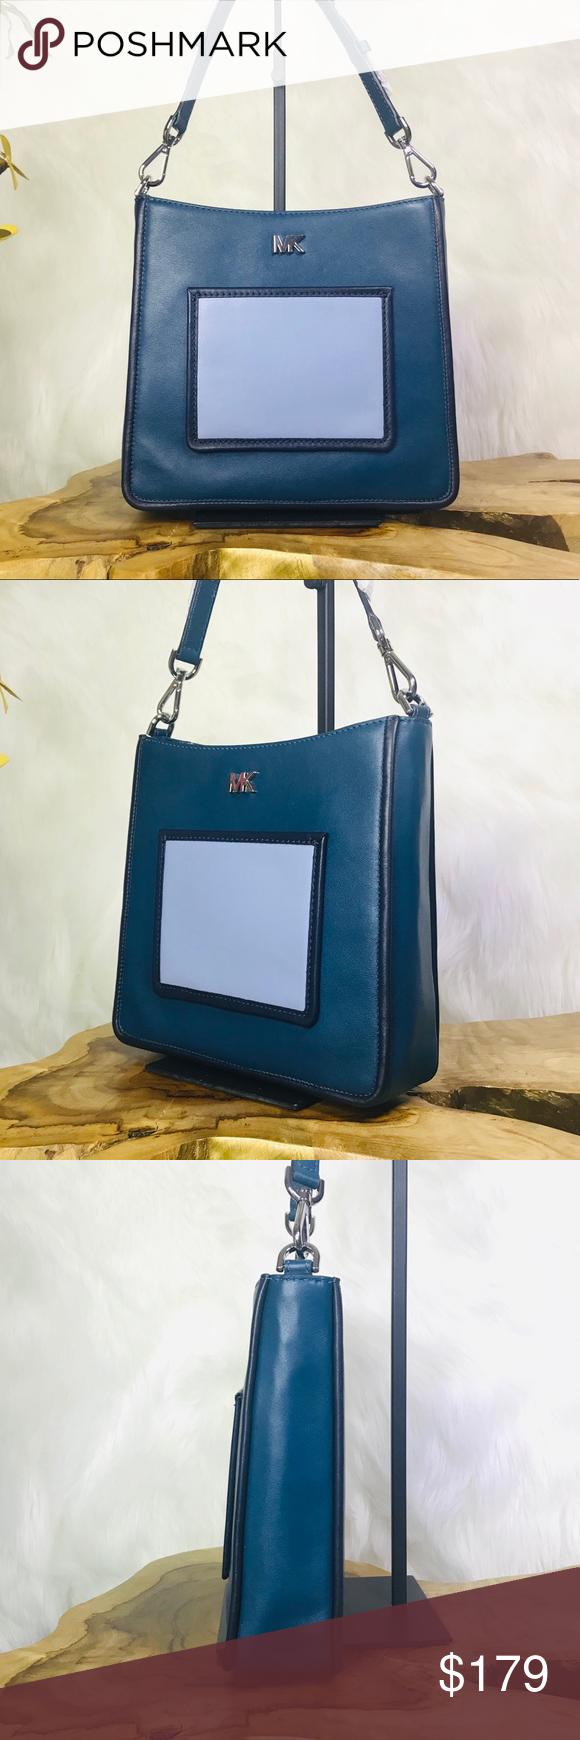 5a47558073ec Michael Kors Gloria Pocket Swing Pack Crossbody MICHAEL Michael Kors Gloria  Pocket Swing Pack Crossbody Bag